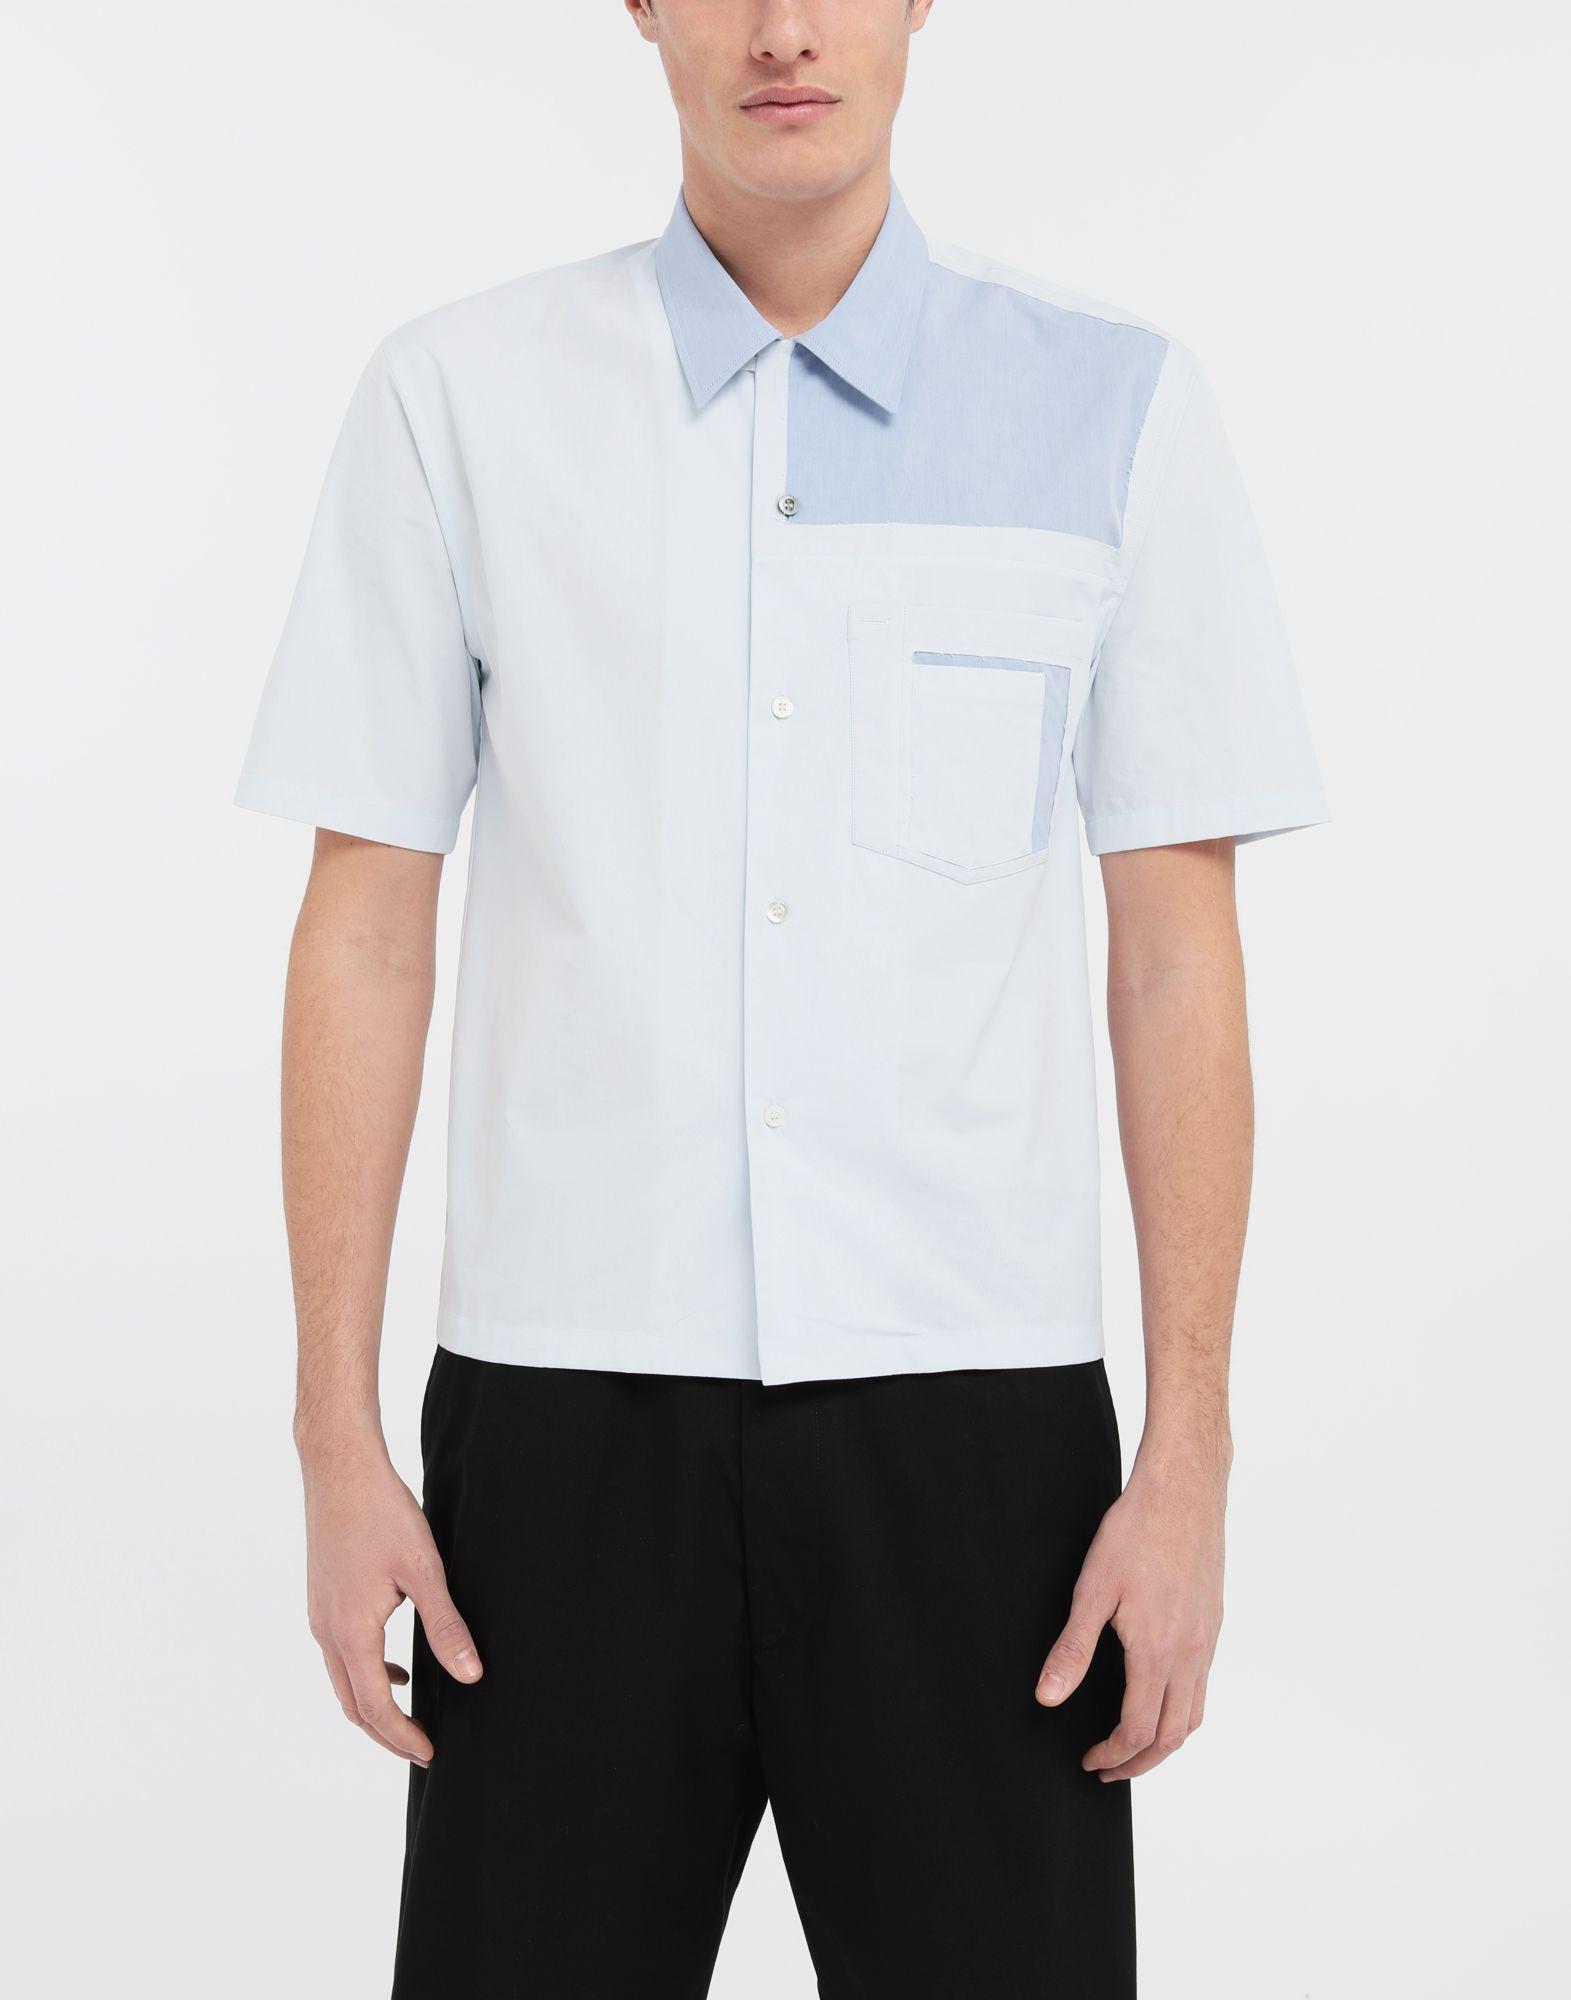 MAISON MARGIELA Décortiqué pocket shirt Short sleeve shirt Man r